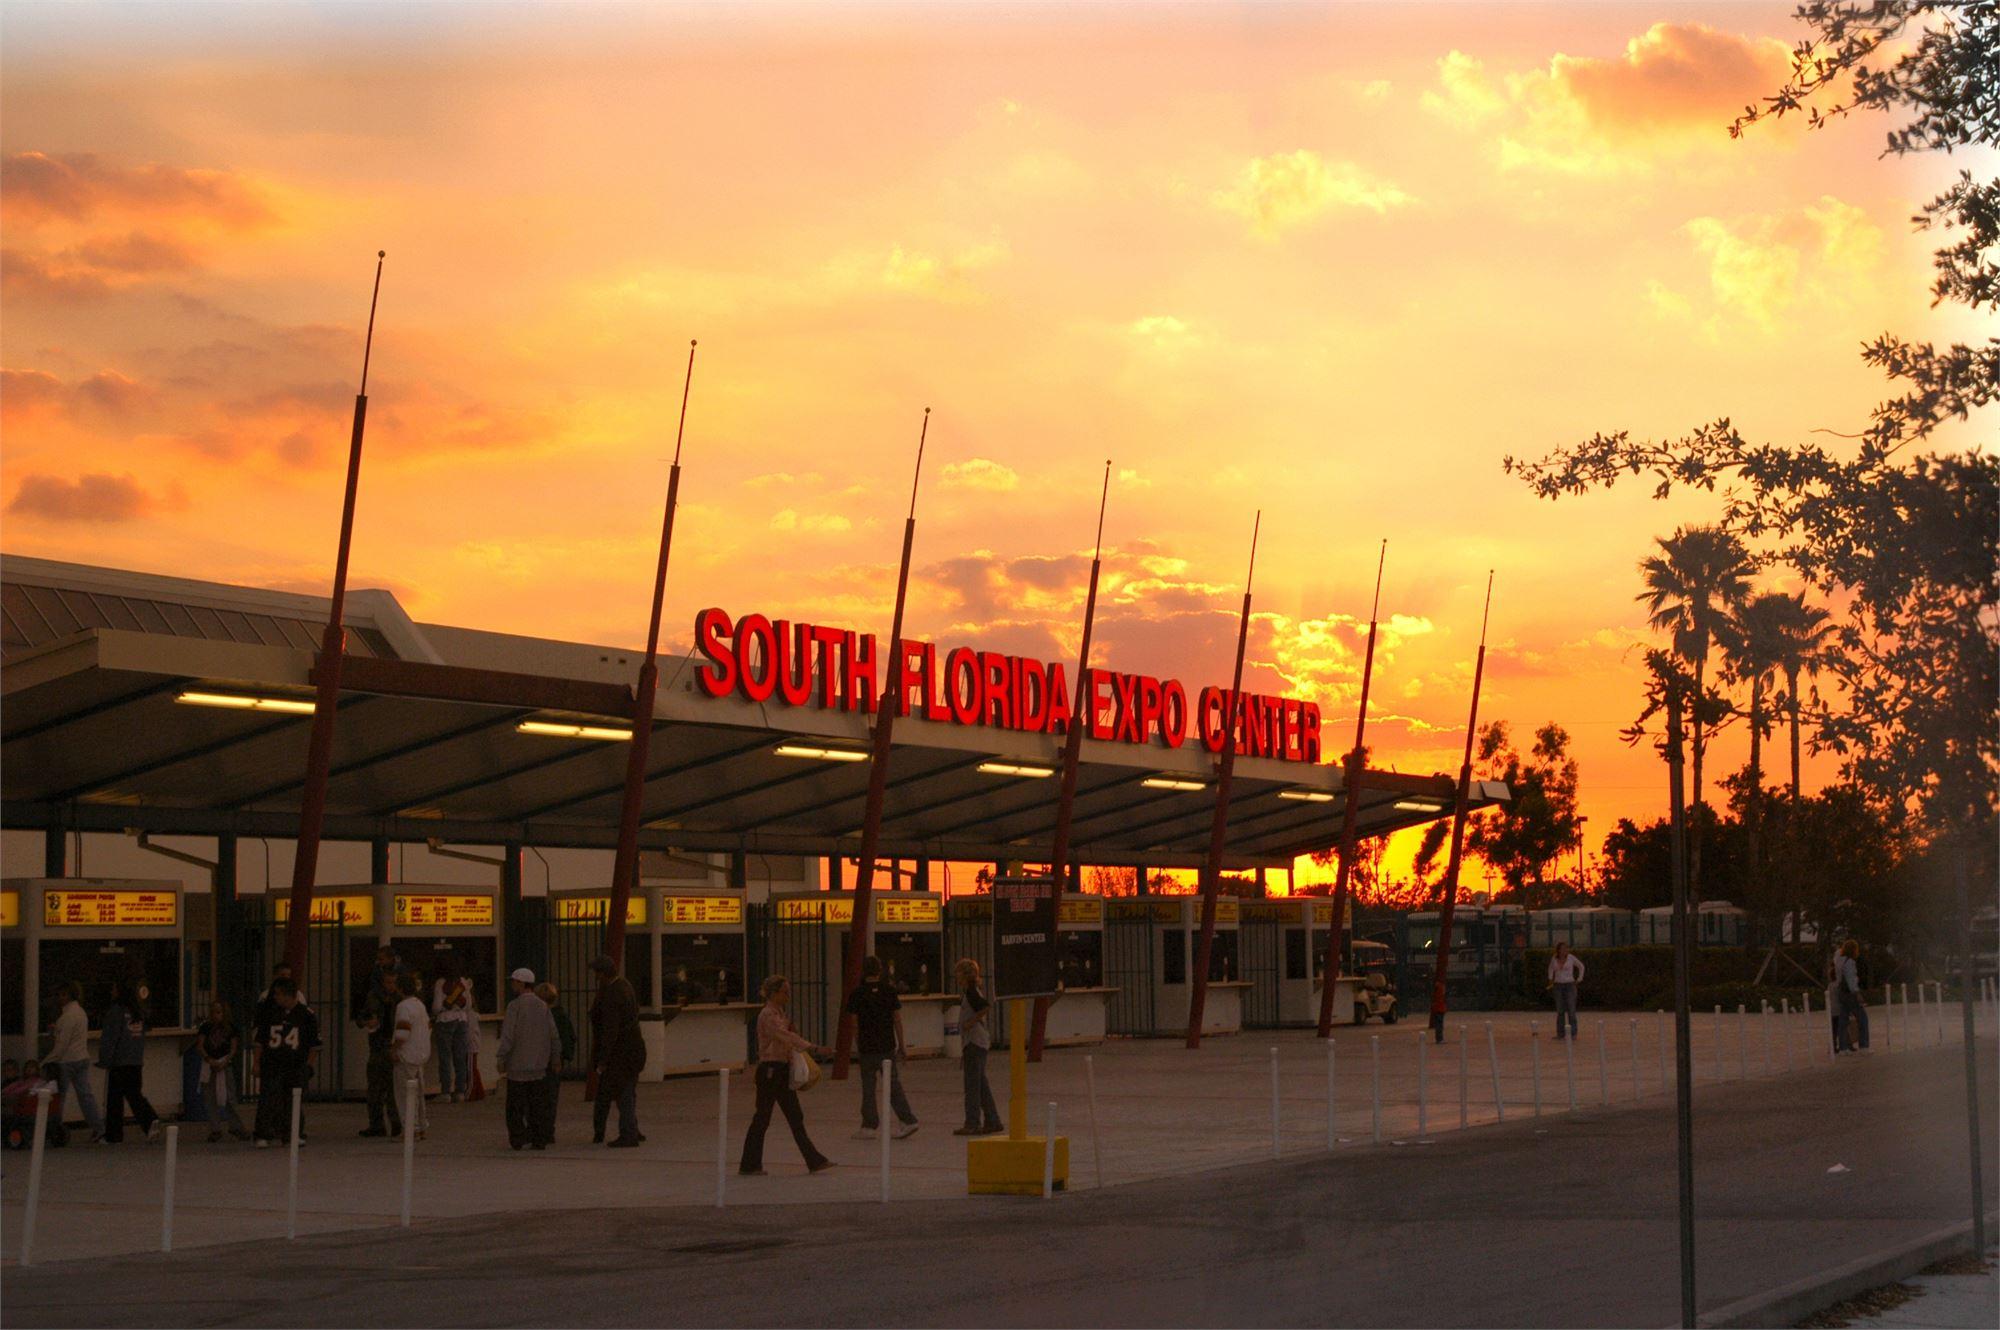 Expo Center At The South Florida Fairgrounds pertaining to South Florida Fairgrounds Event Schedule